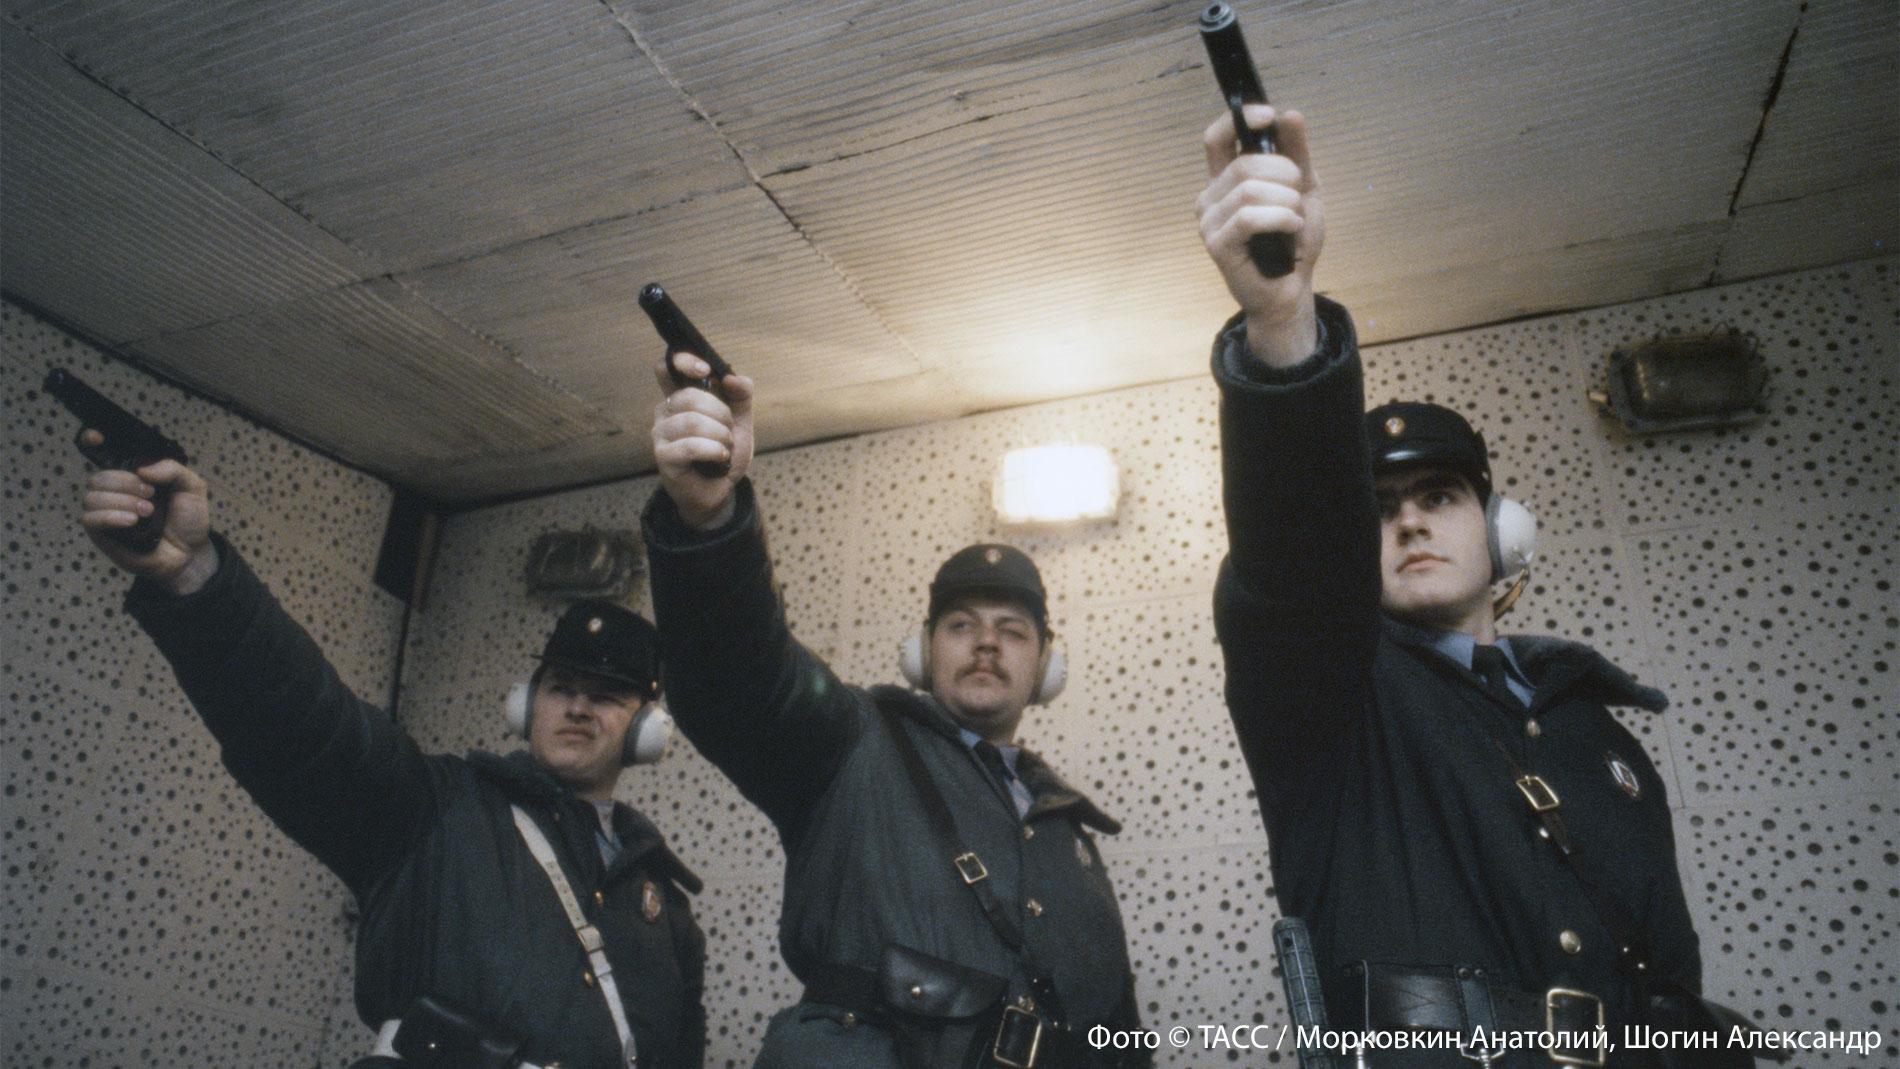 <p>Фото © ТАСС / Анатолий Морковкин, Александр Шогин </p>